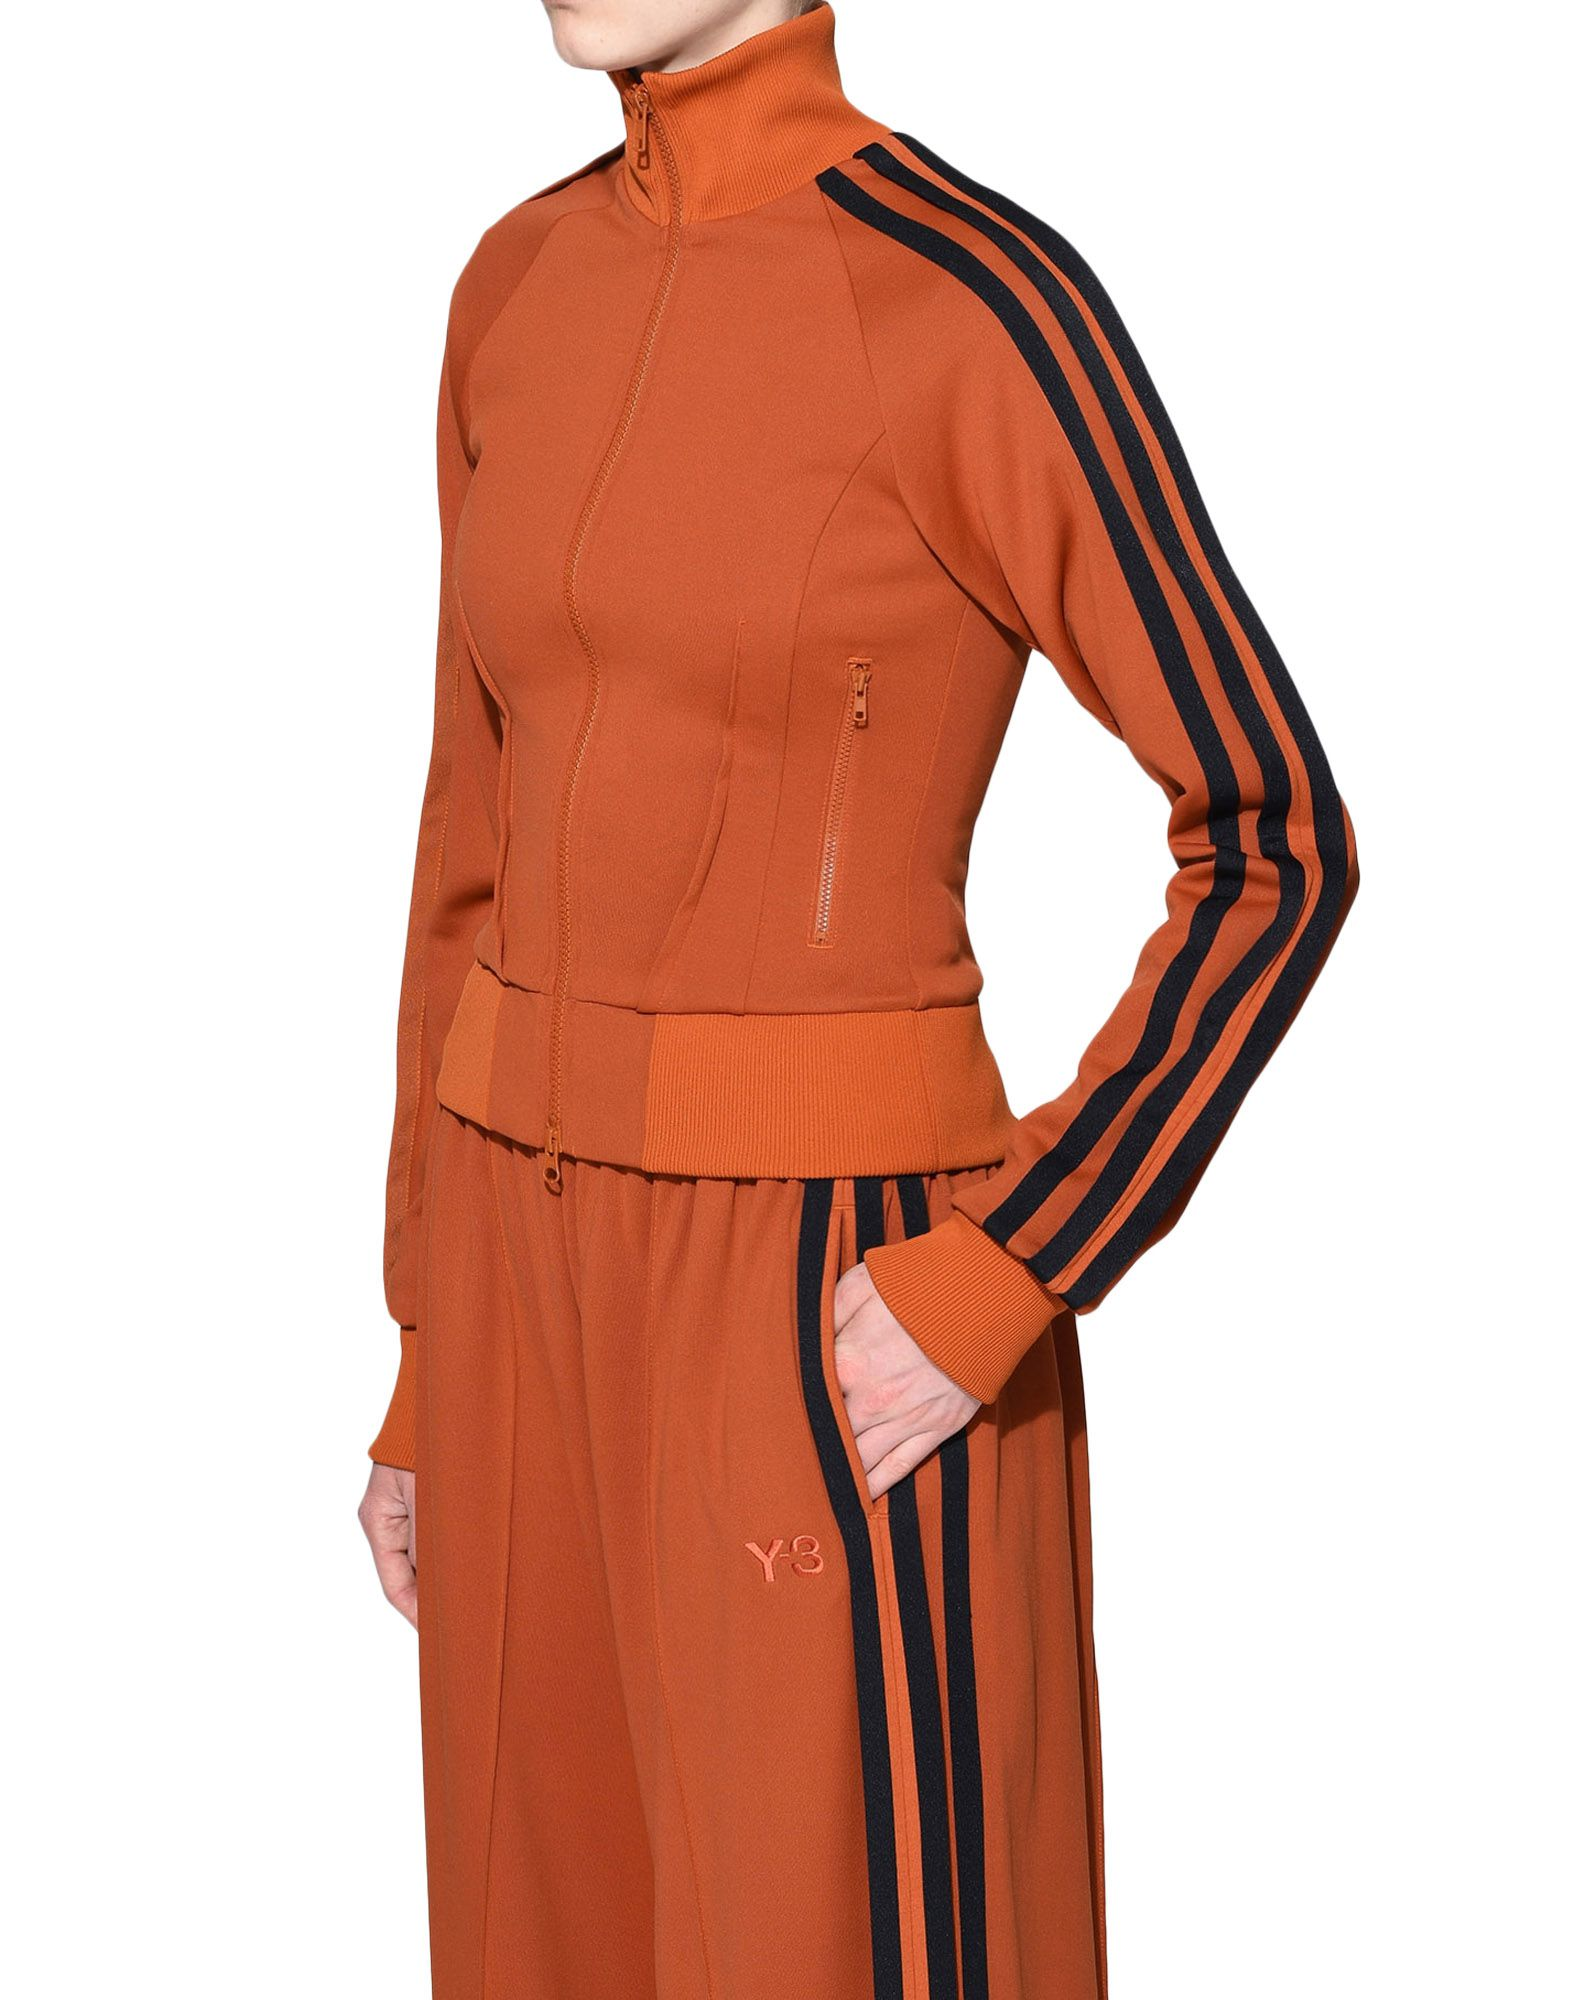 Y-3 Y-3 3-Stripes Selvedge Matte Track Jacket Track top Woman e